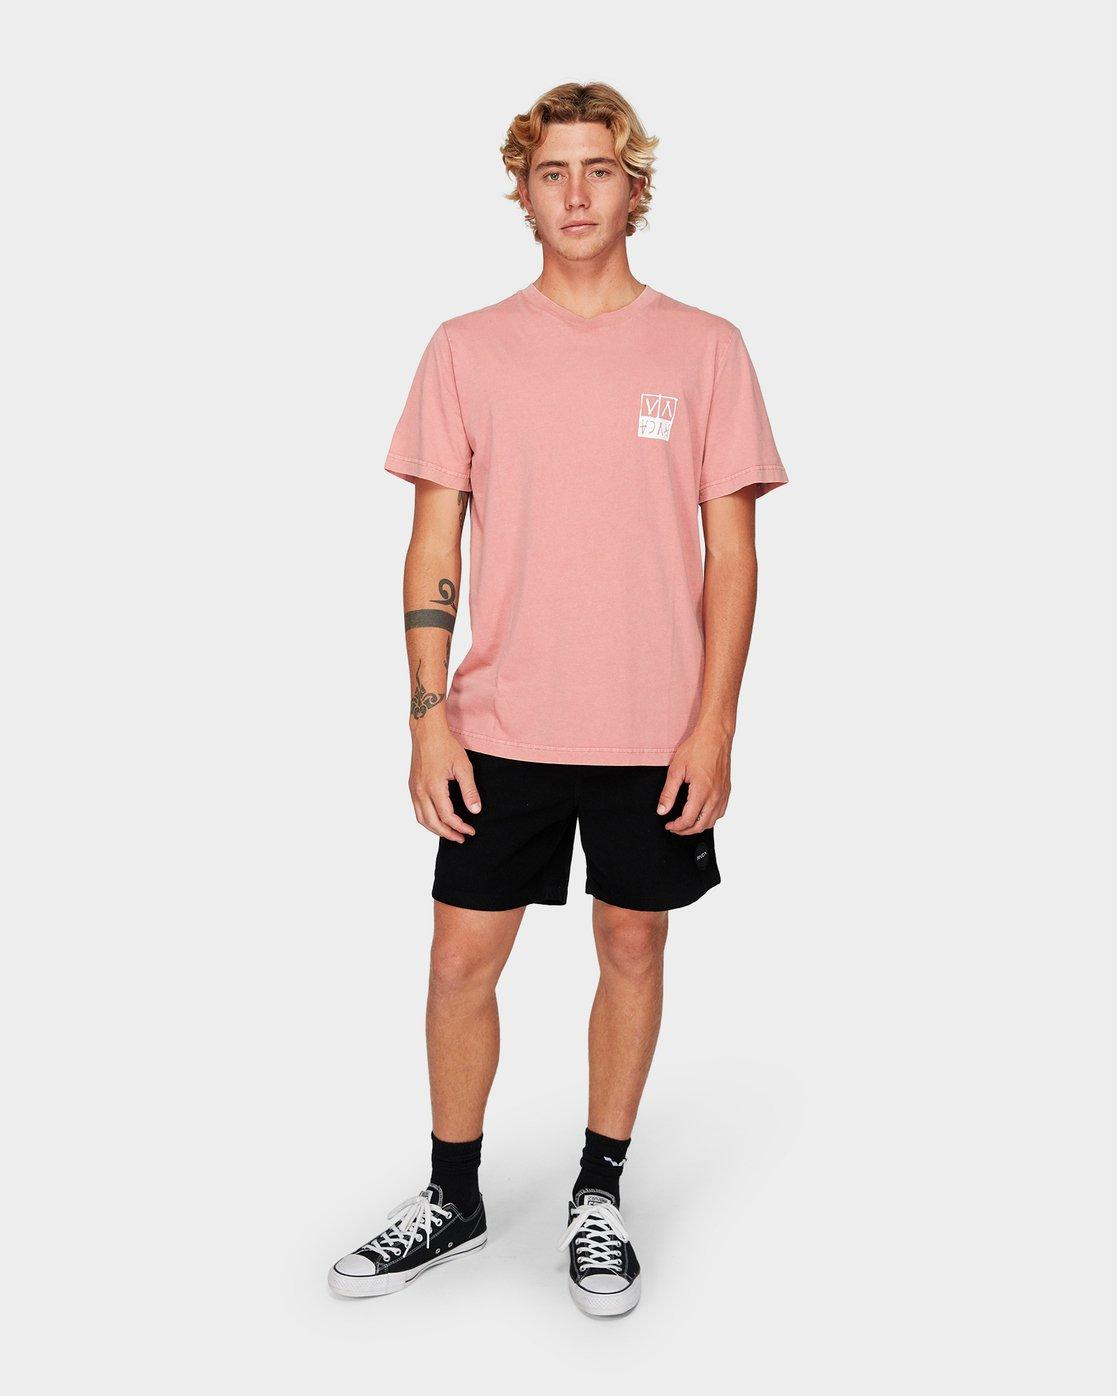 3 RVCA Unplugged Short Sleeve T-Shirt  R192041 RVCA